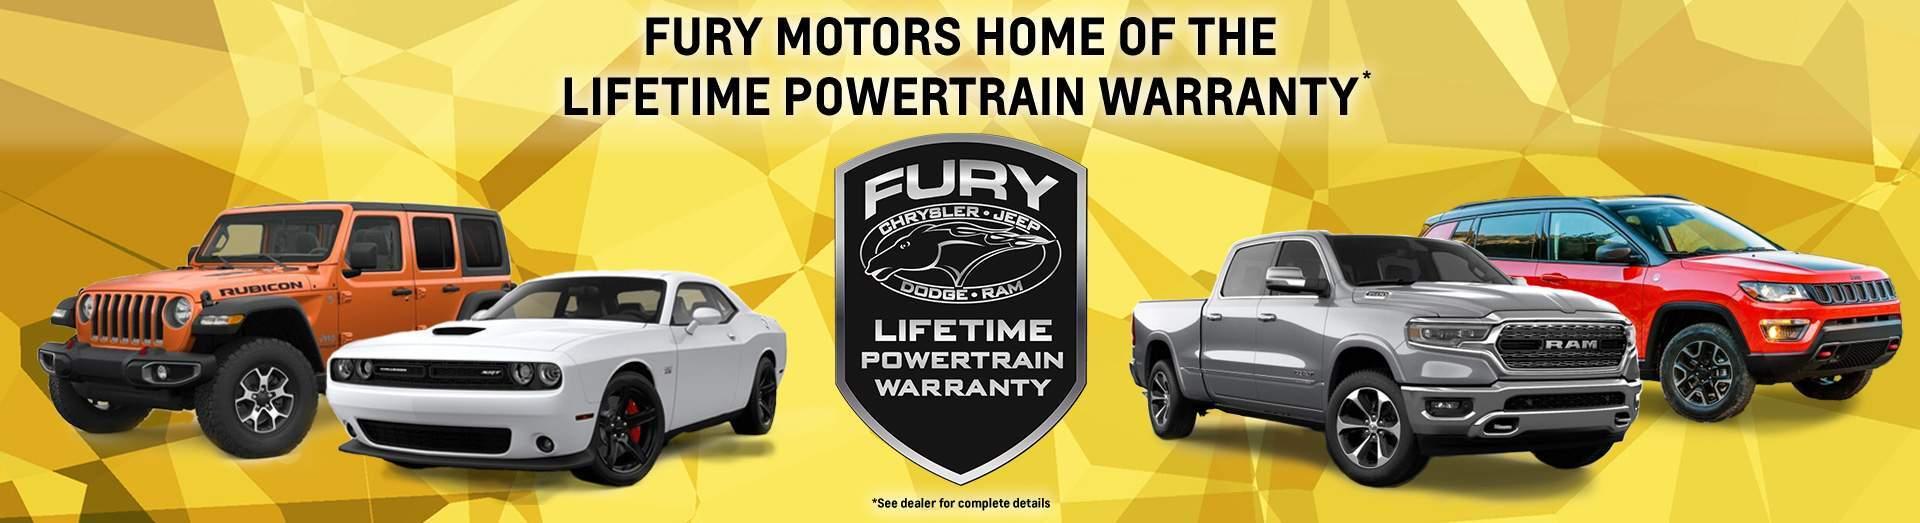 hight resolution of fury complimentary lifetime powertrain warranty